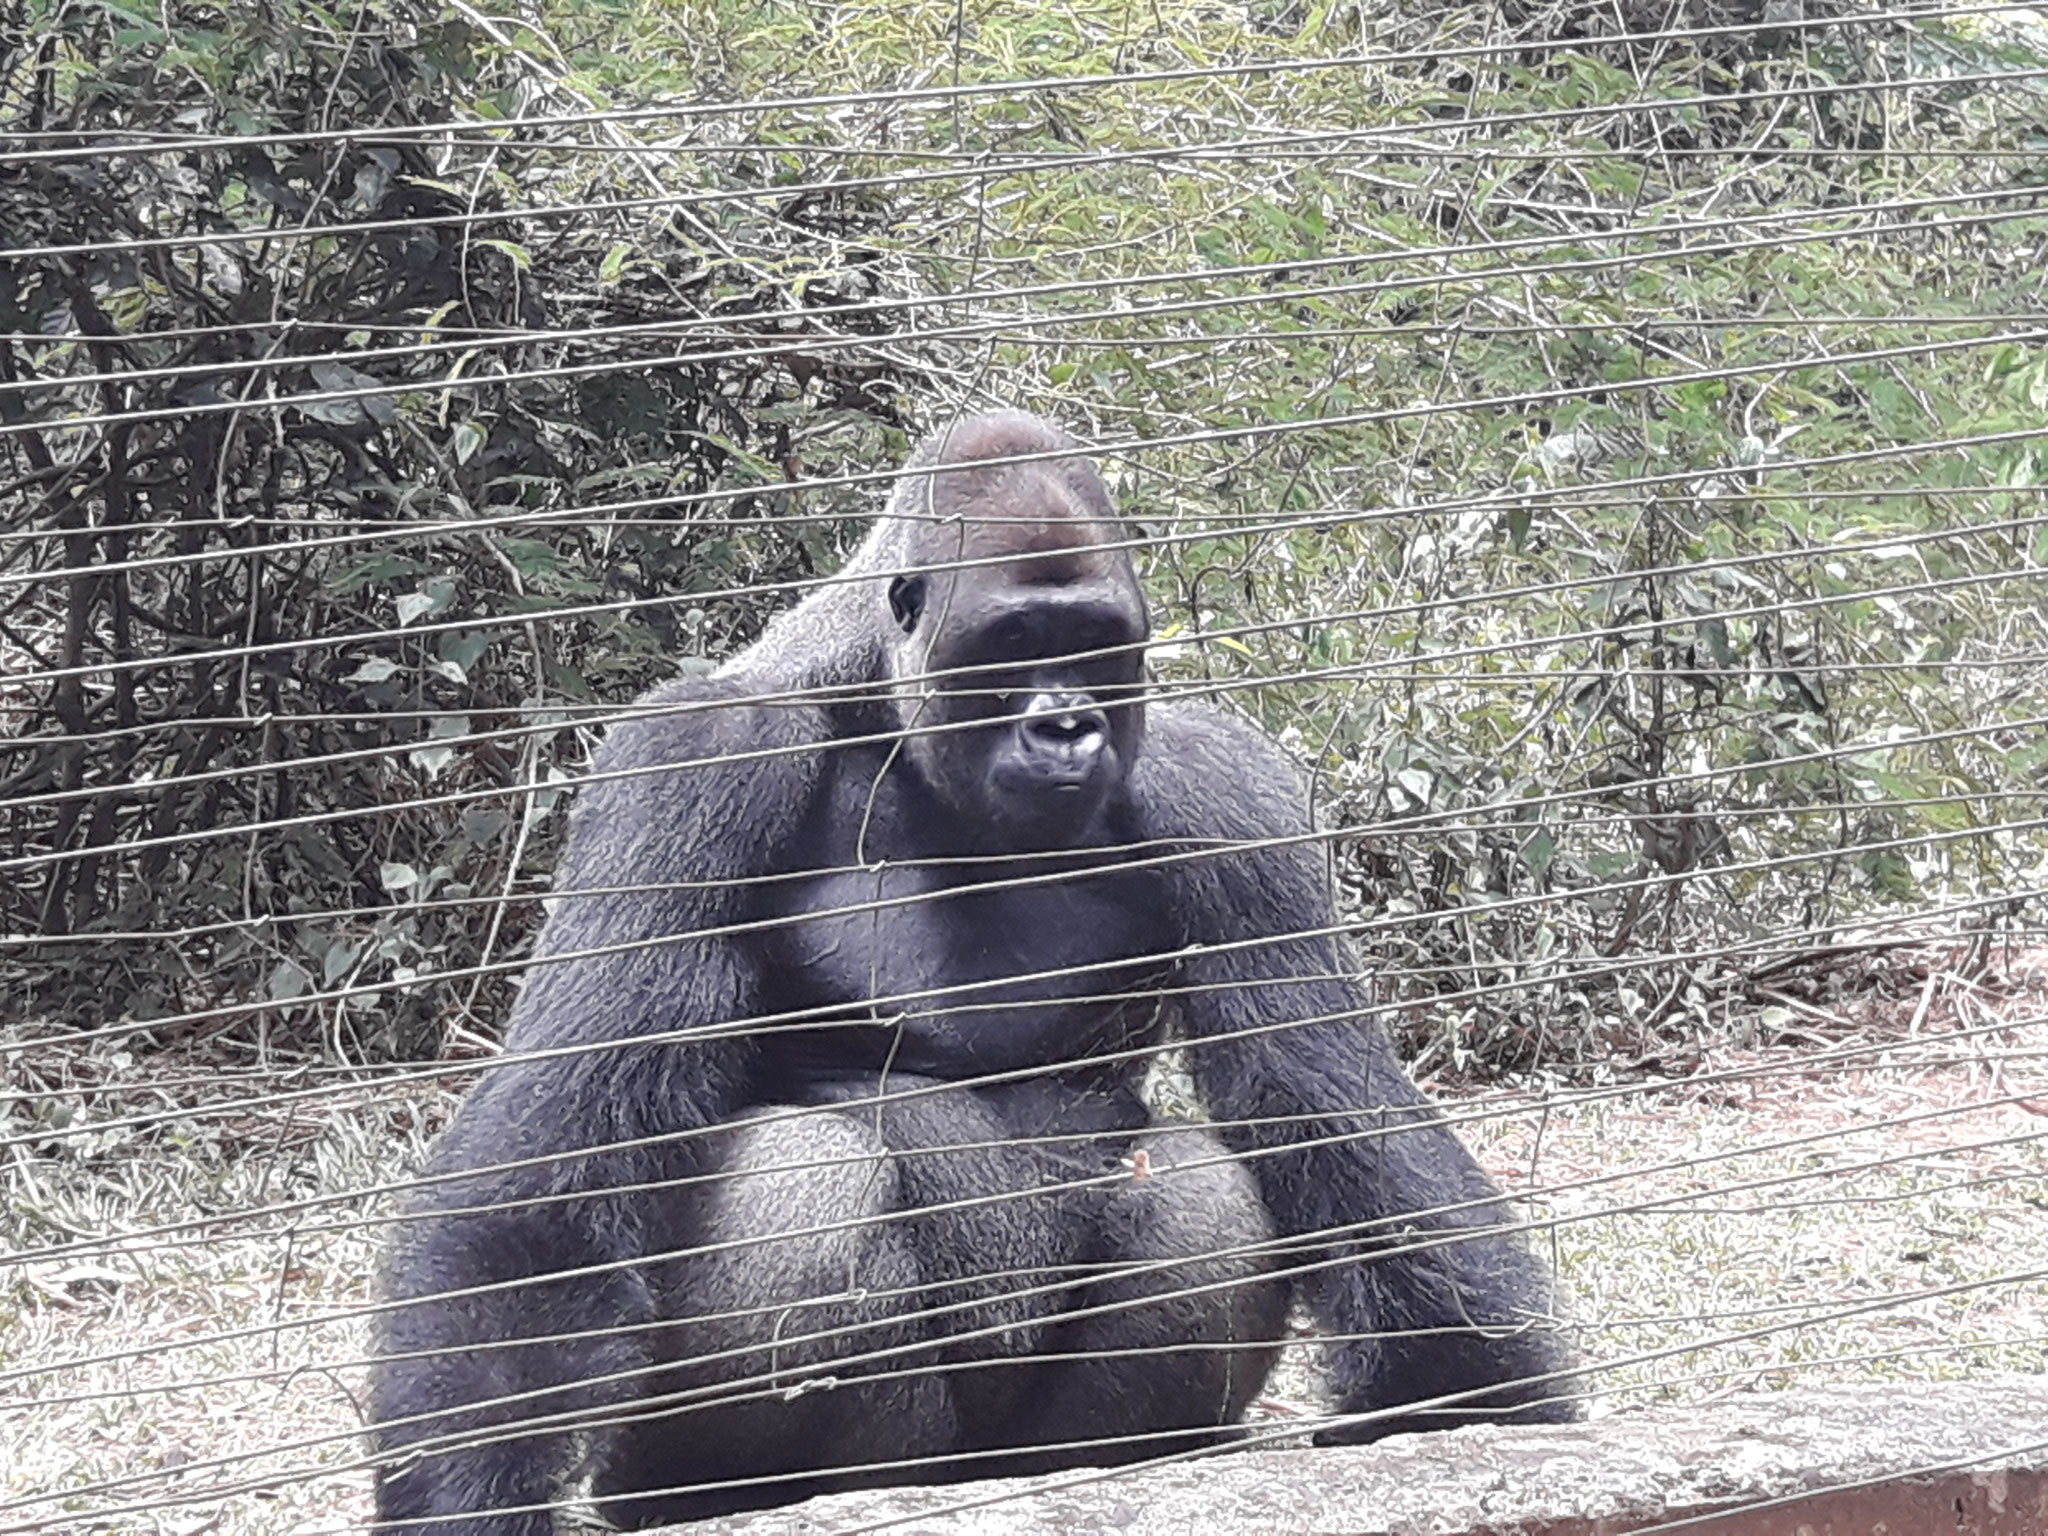 Gorila en recuperacion